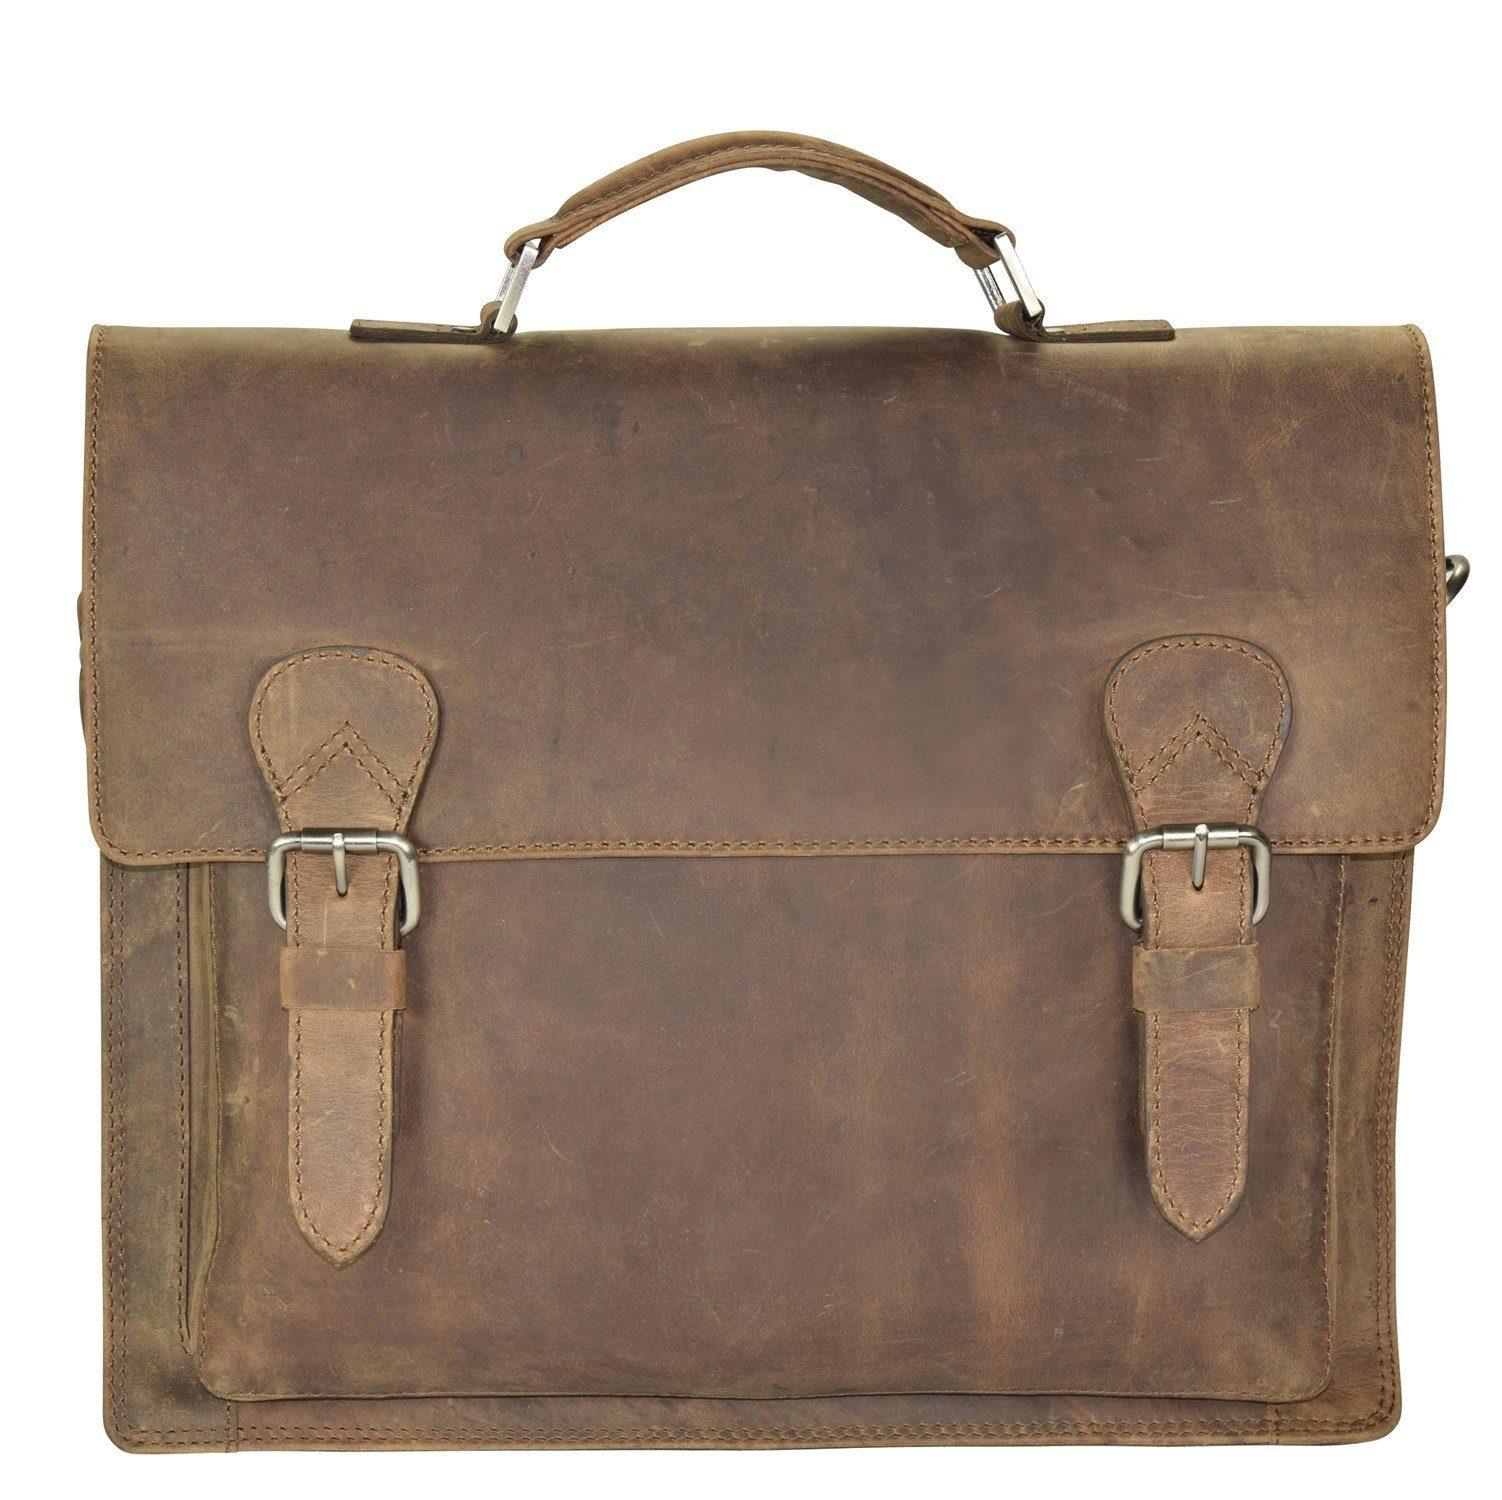 Harold's Antik Casual Aktentasche Leder 40 cm Laptopfach